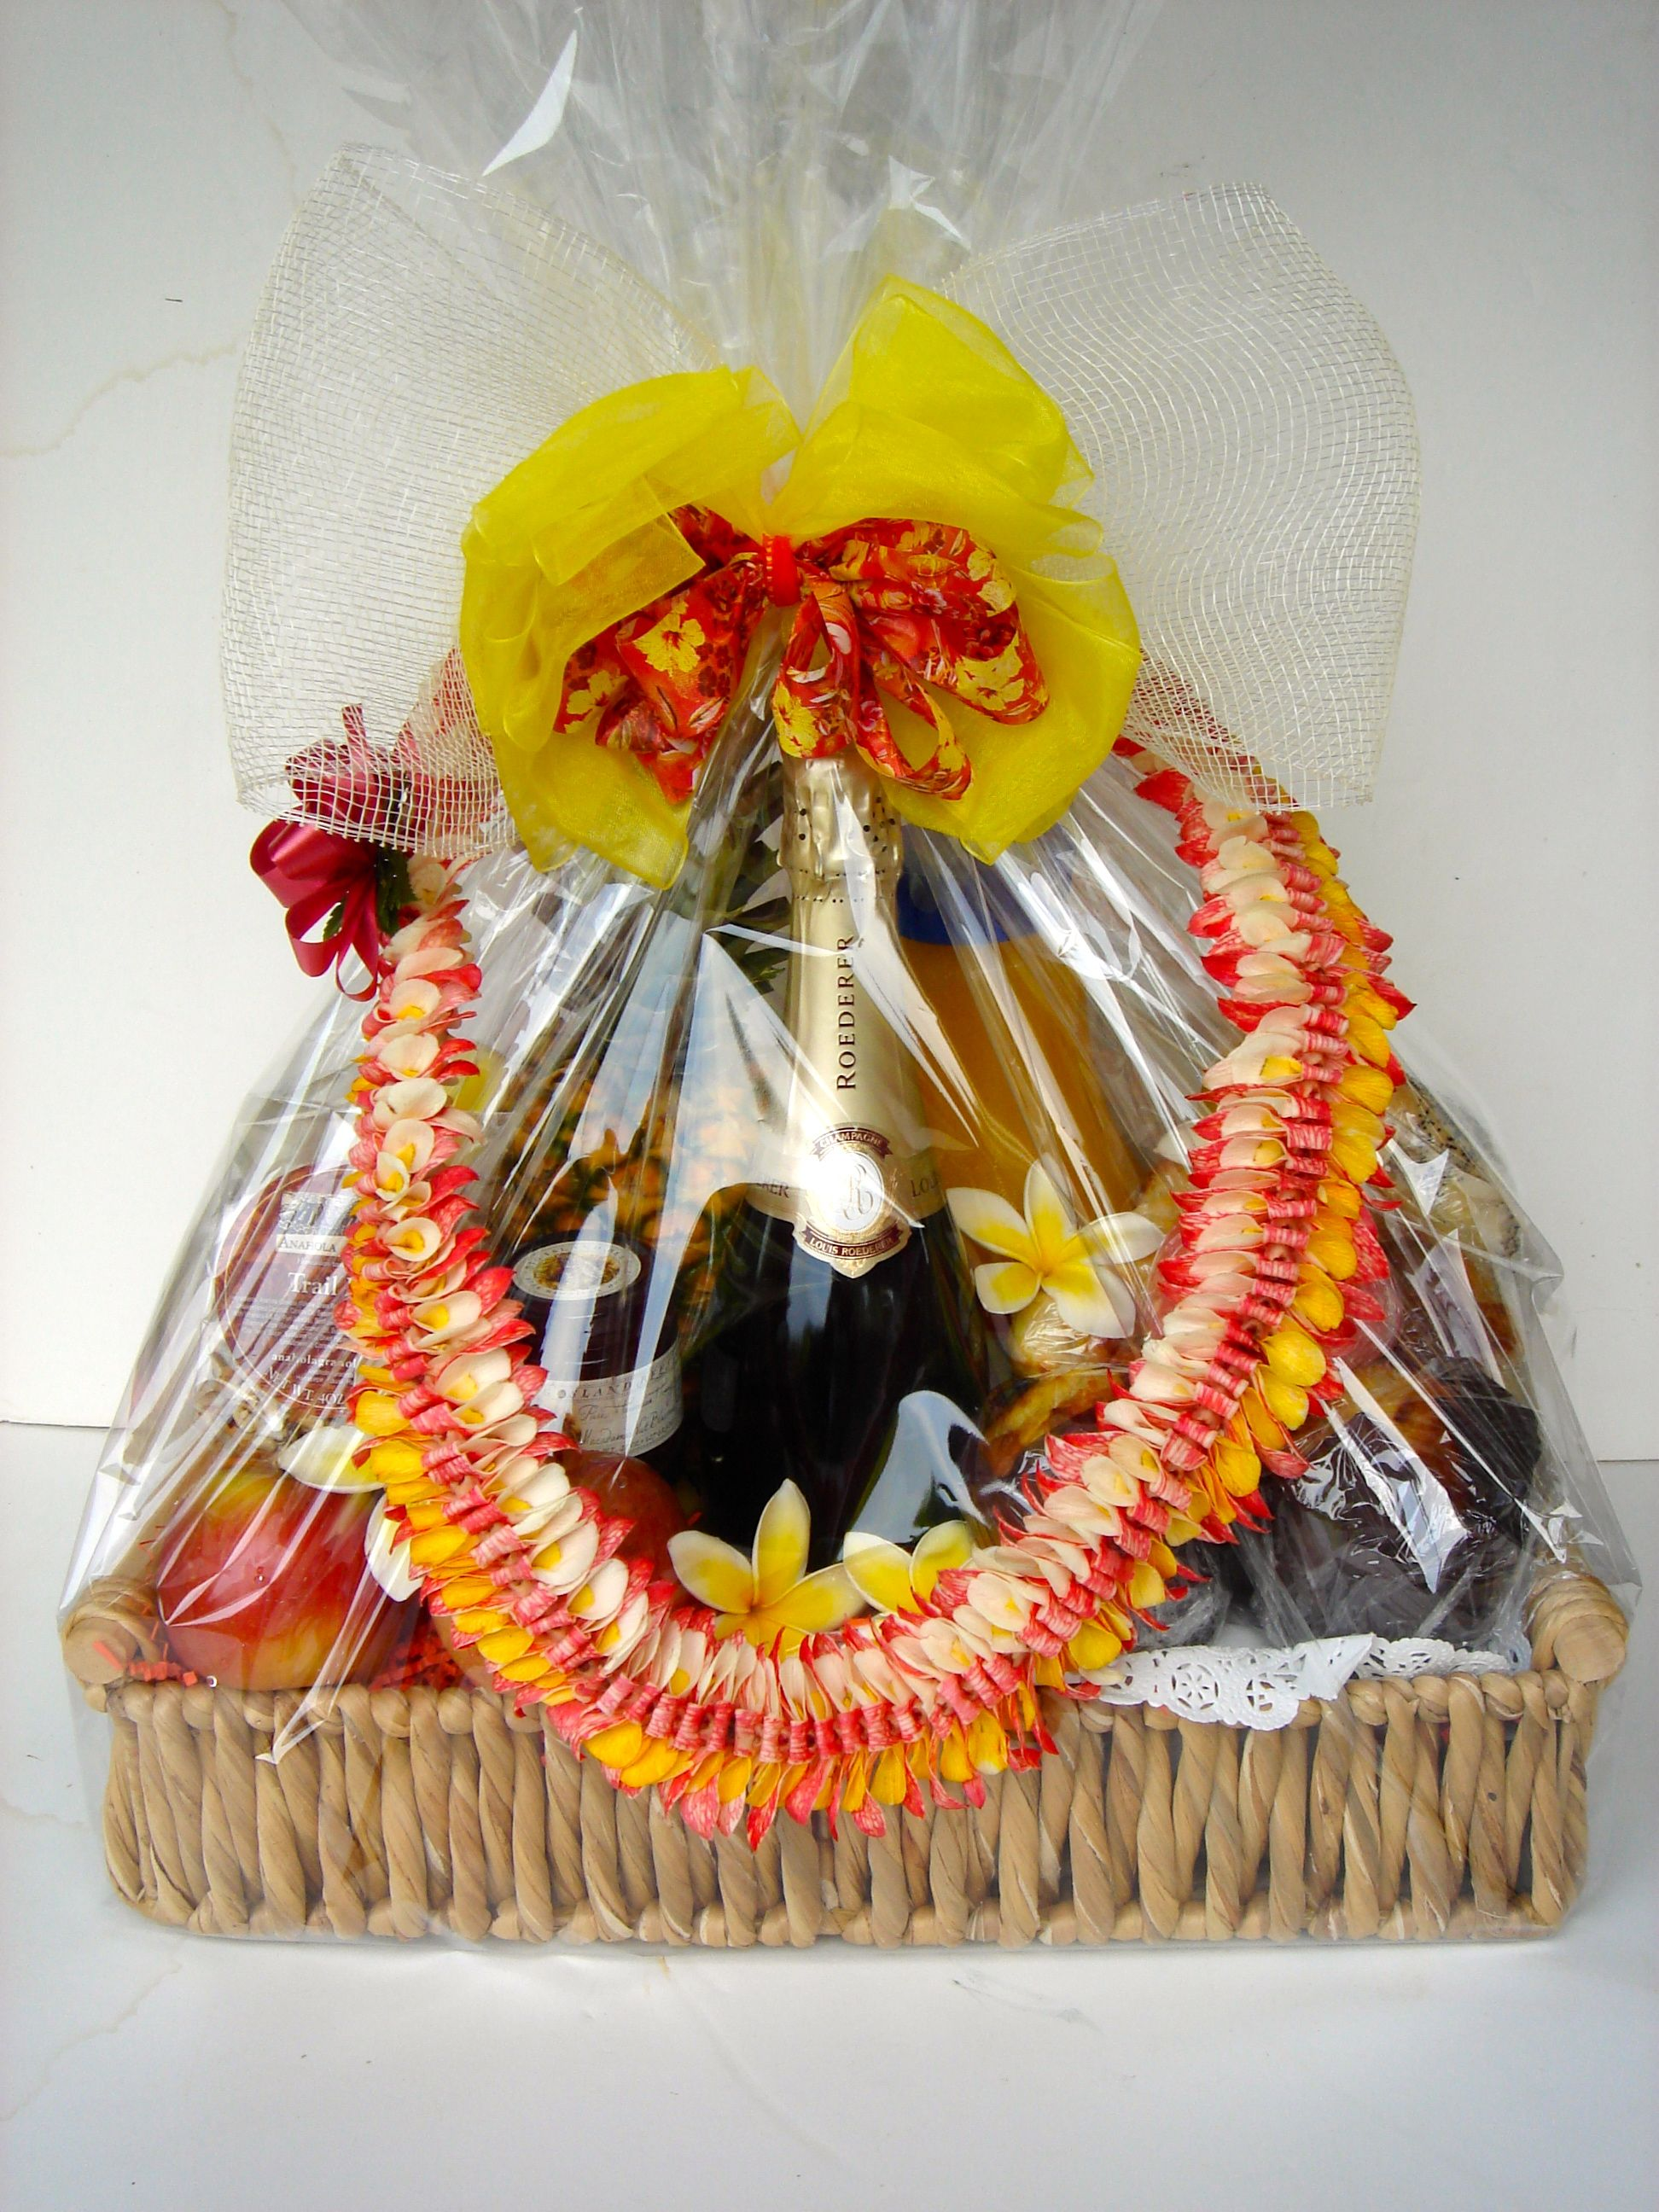 Awesome Custom Hawaiian Gift Basket With Gorgeous Fresh Lei (Flower